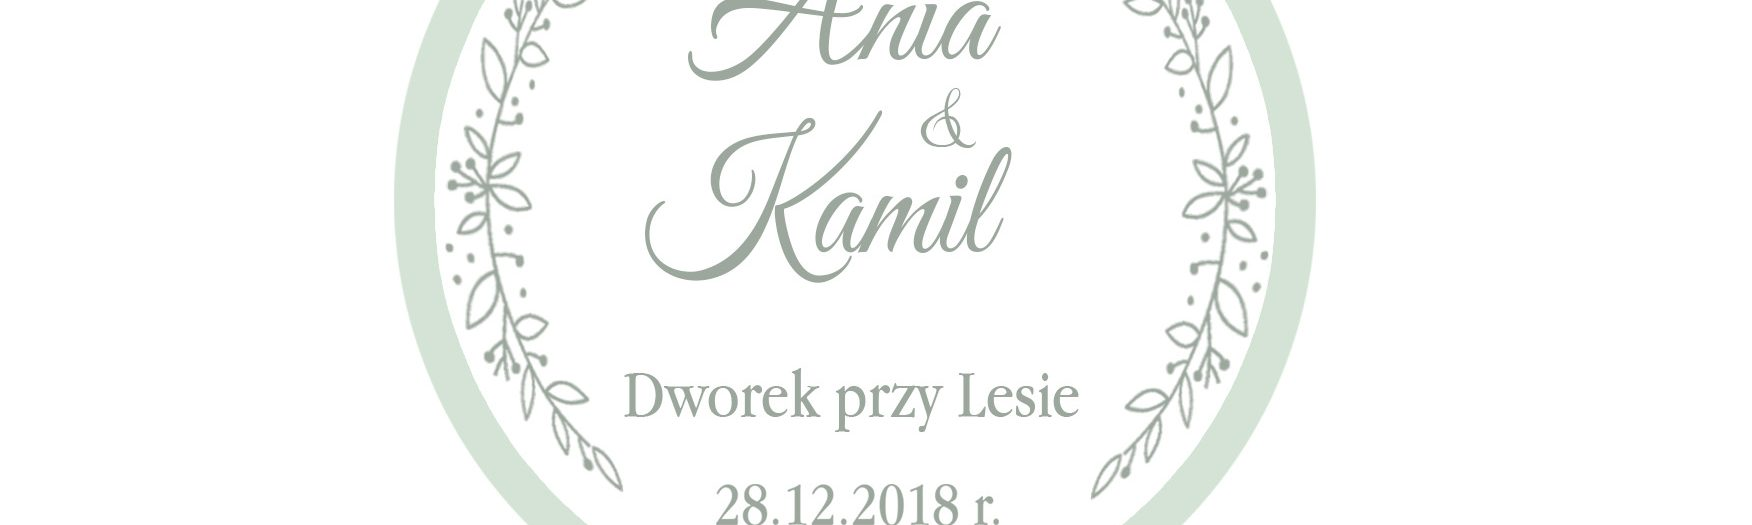 Anna & Kamil grupowe